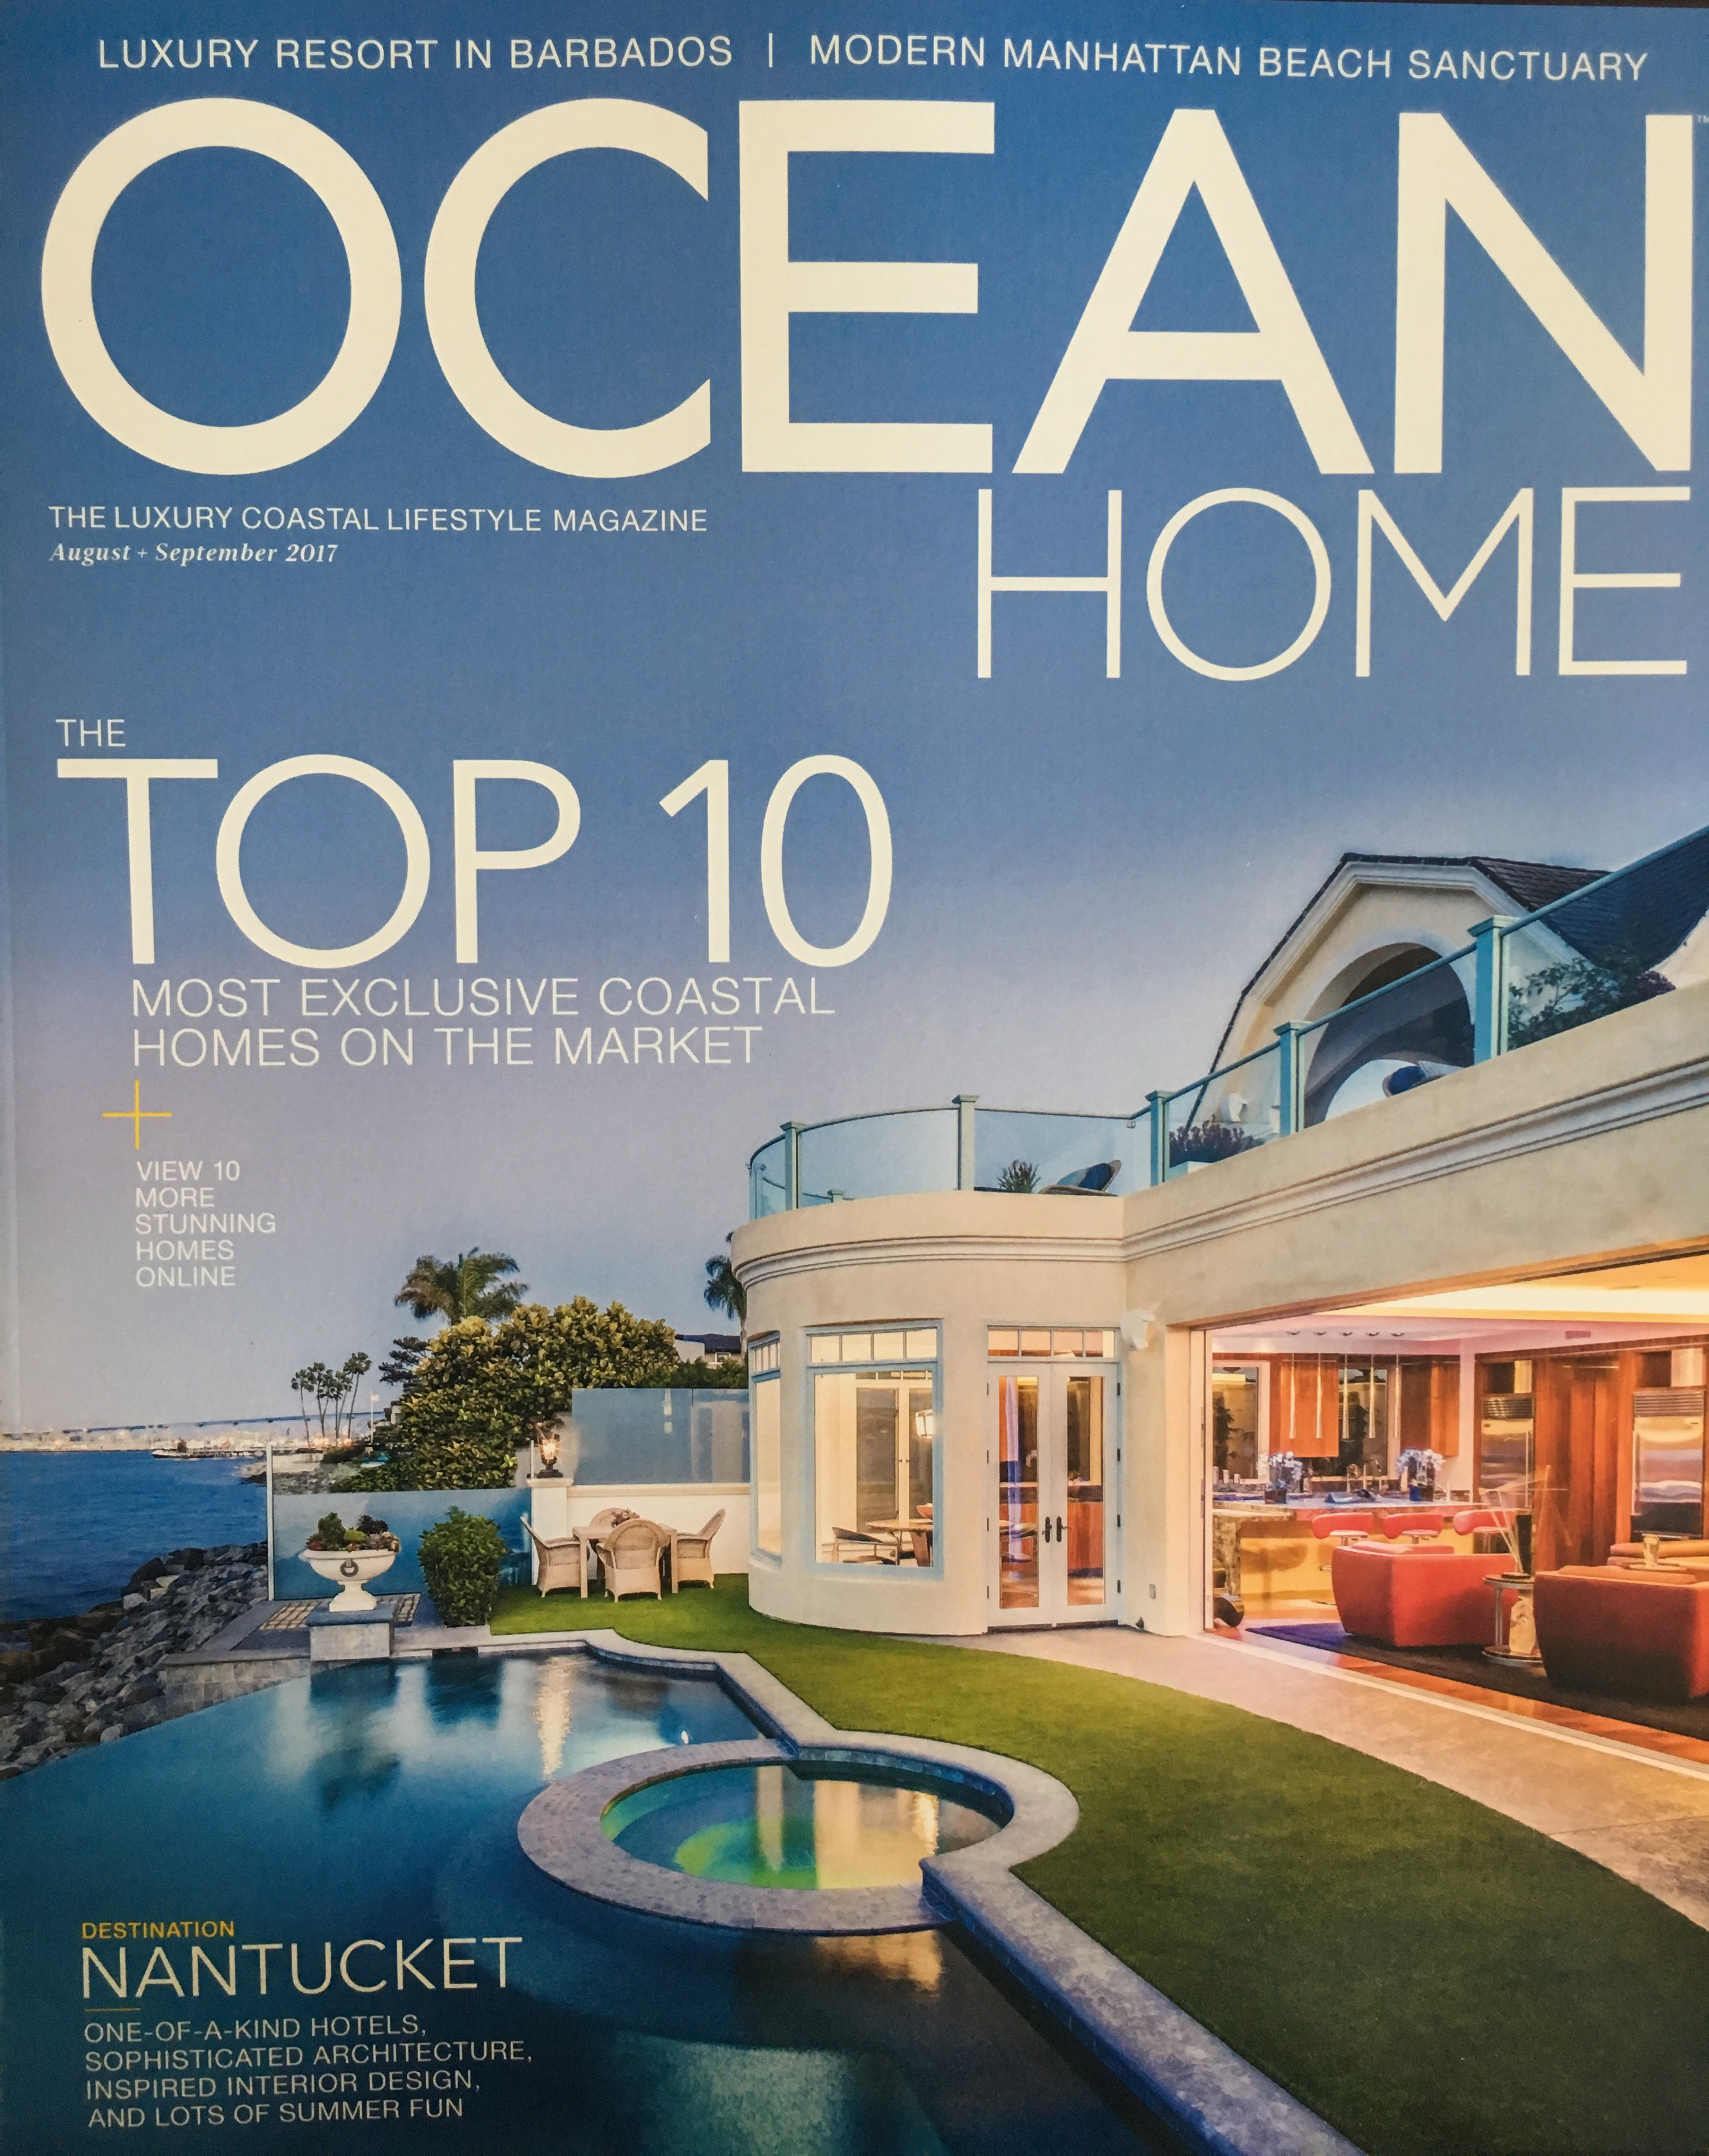 33 Proctor St - Ocean Home magazine top ten list | MA1974 LandVest Blog